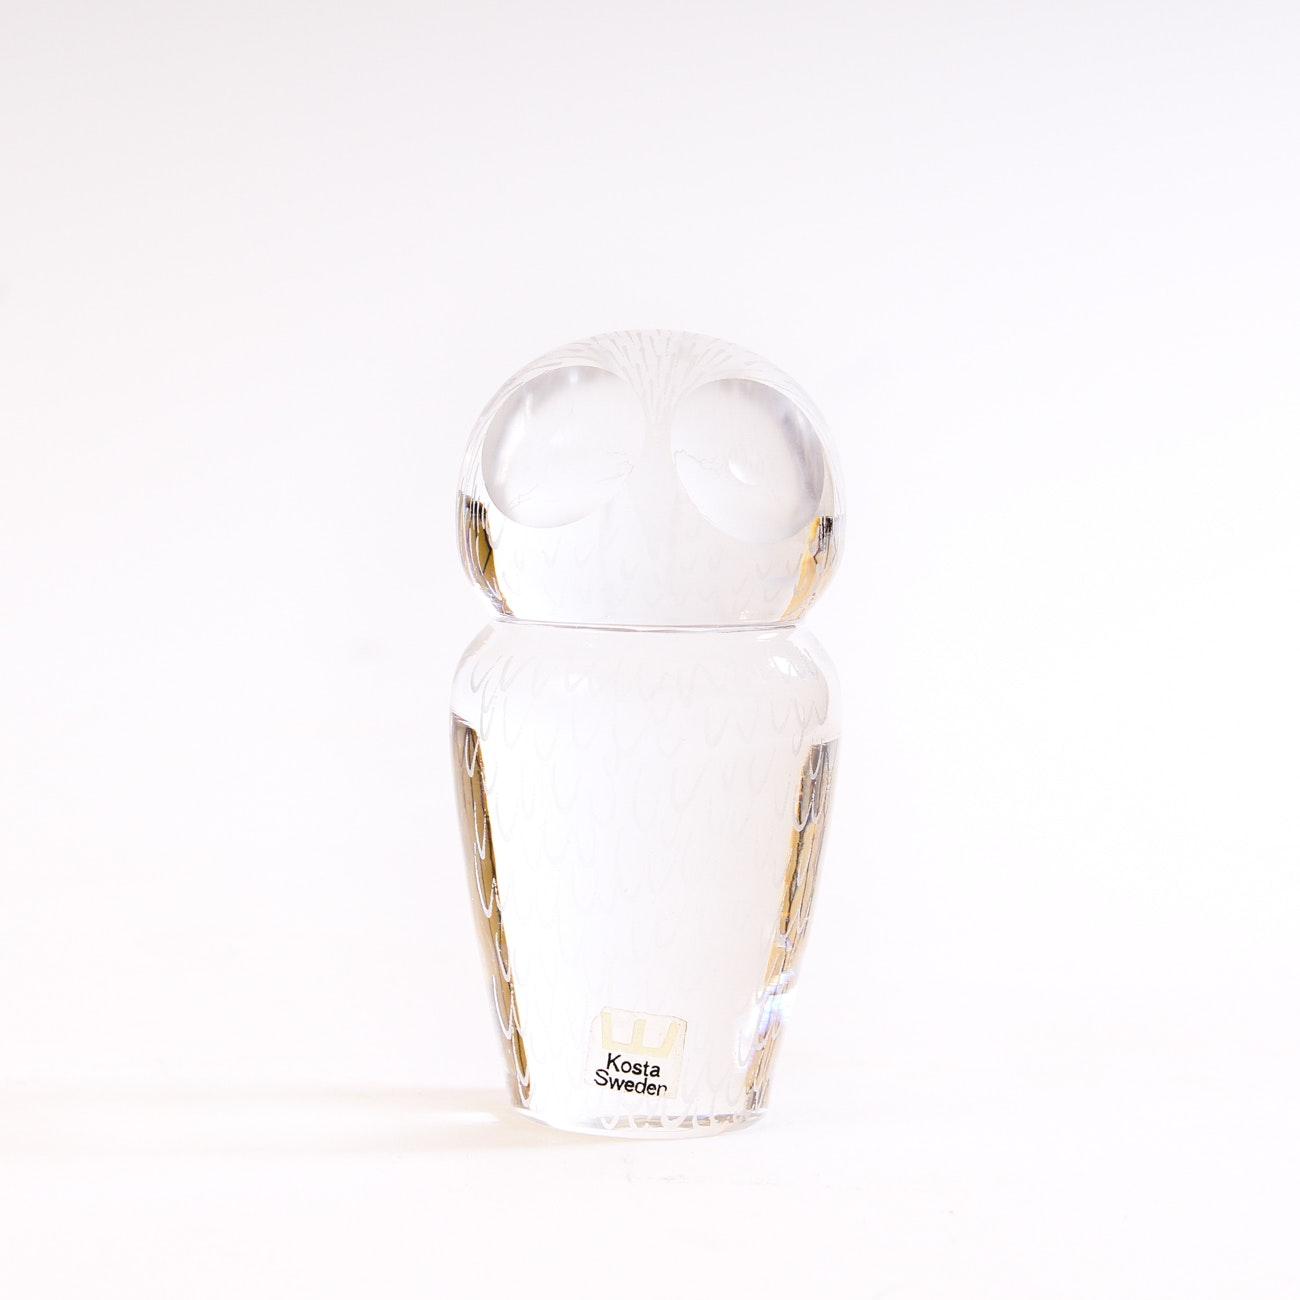 Signed Kosta Boda Art Glass Owl  Paperweight